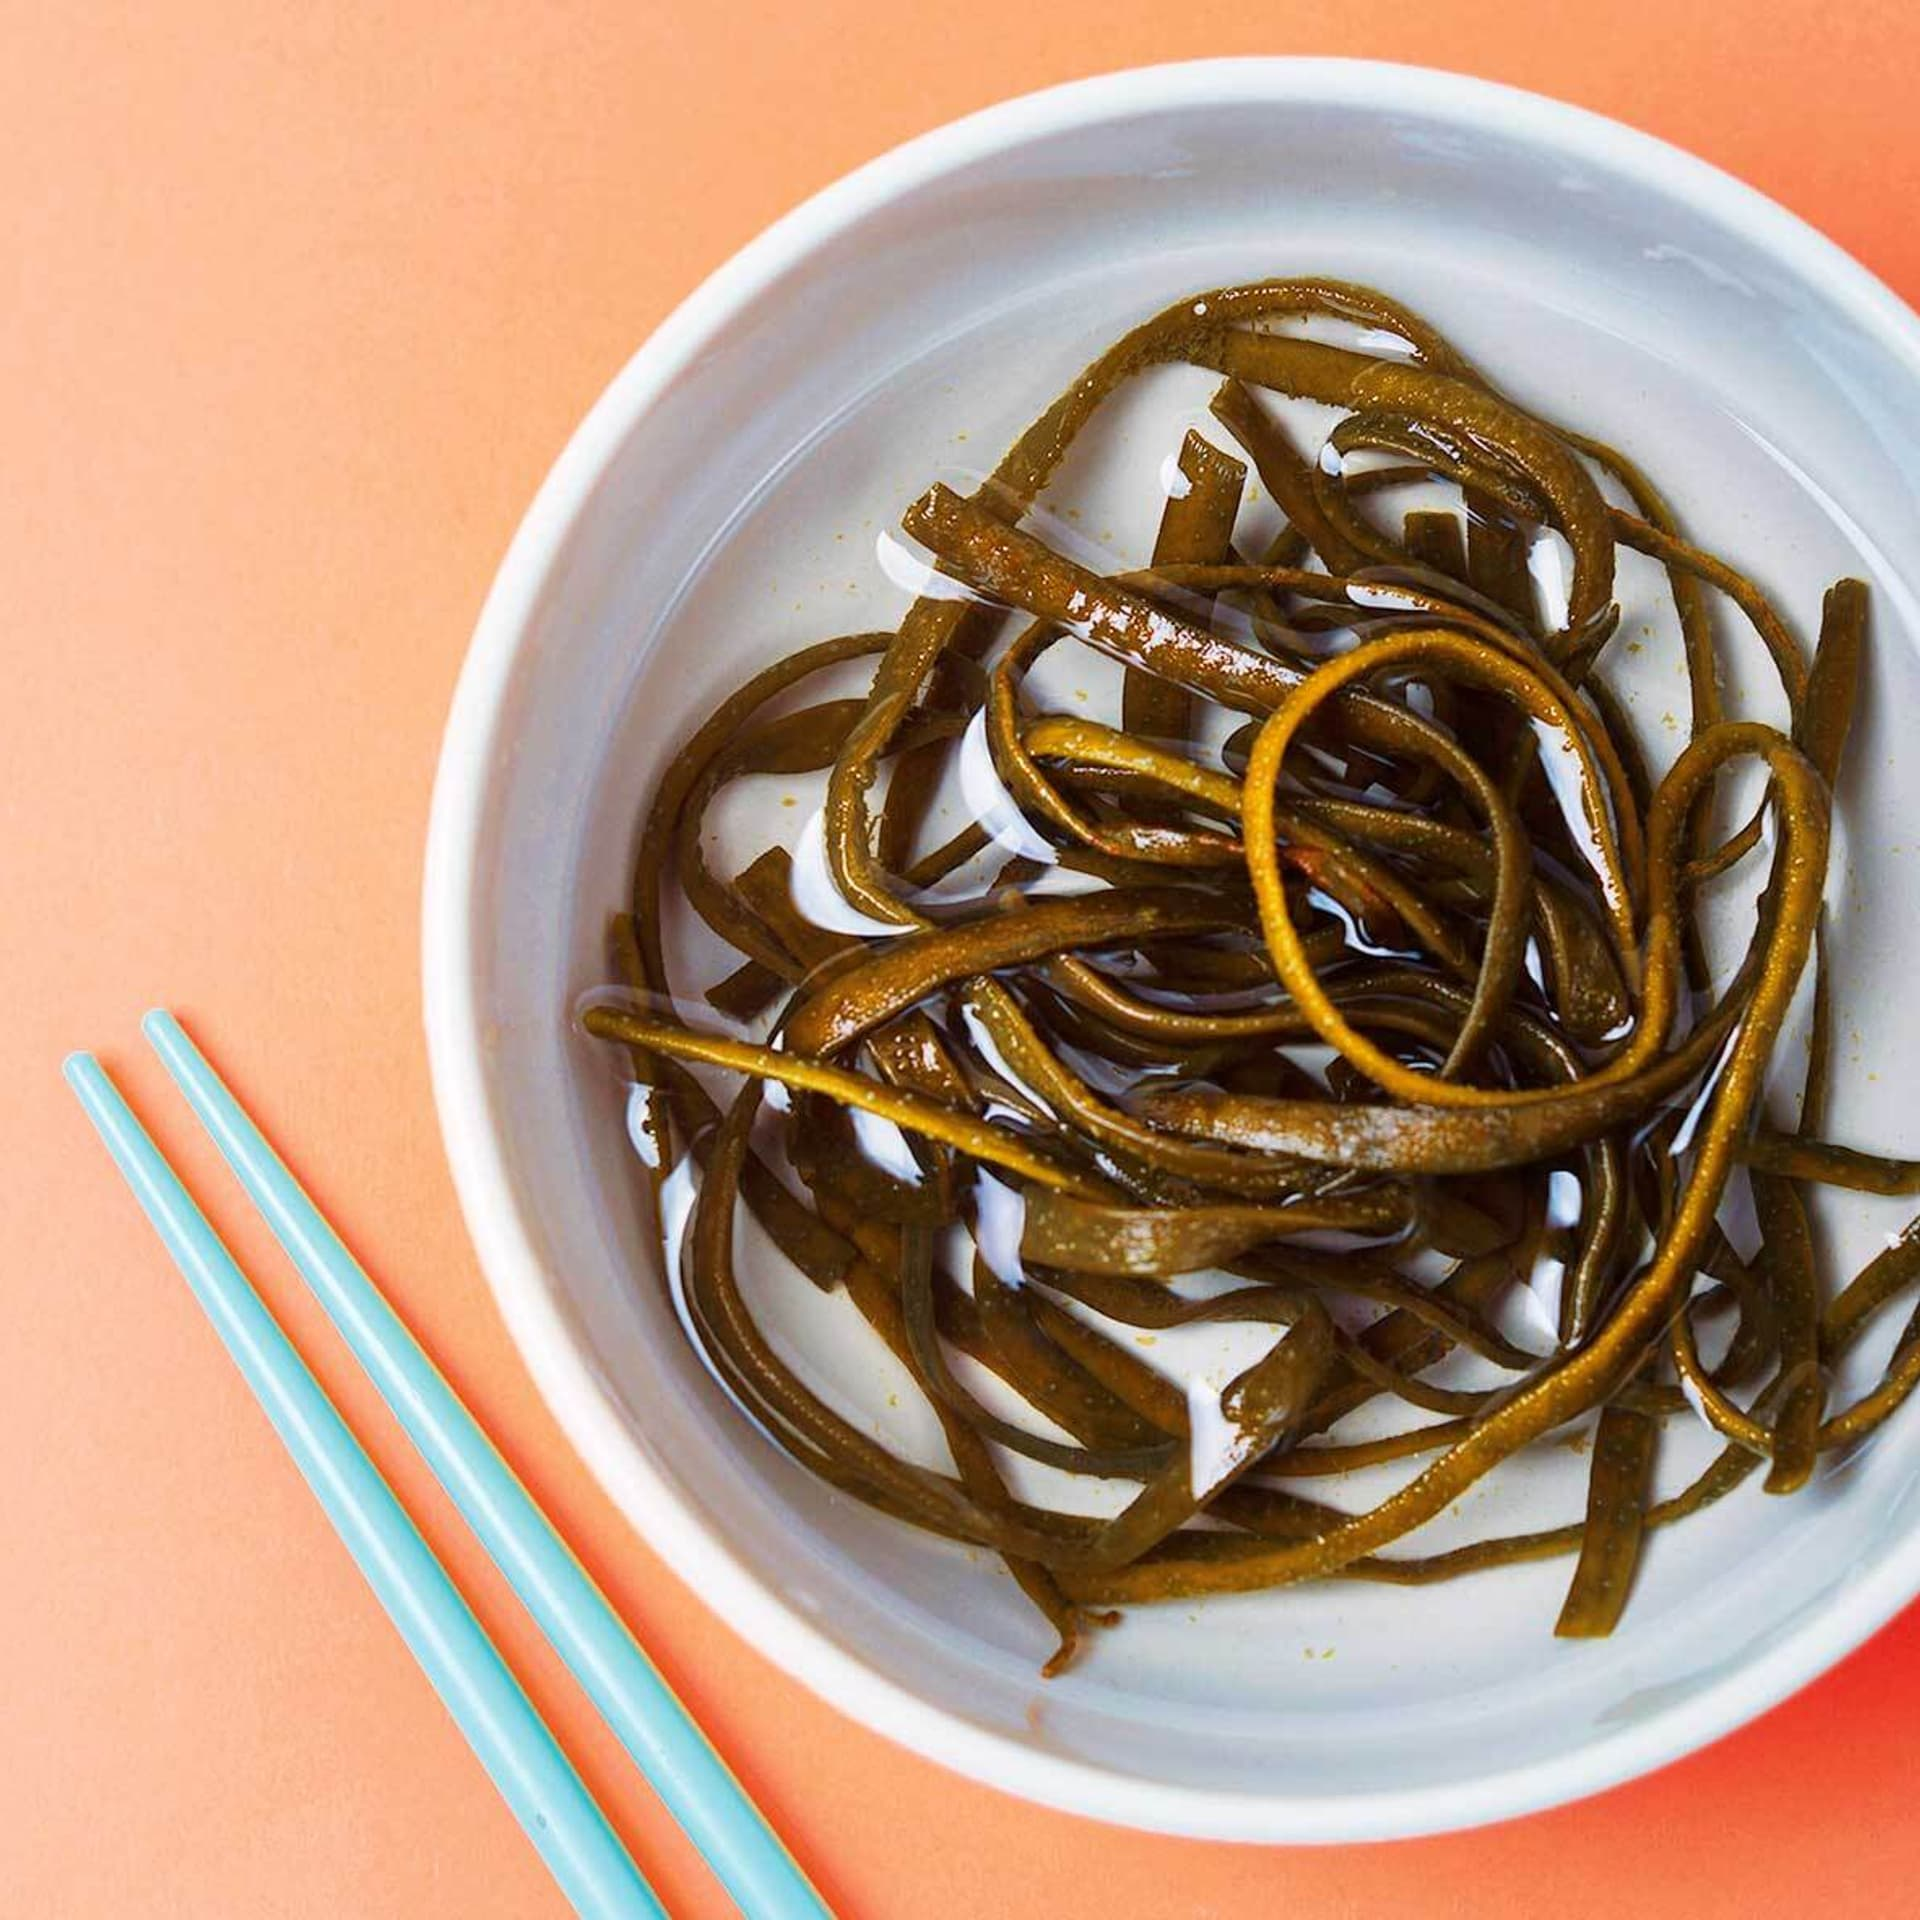 Algen meeres spaghetti (Himanthalia elongata)